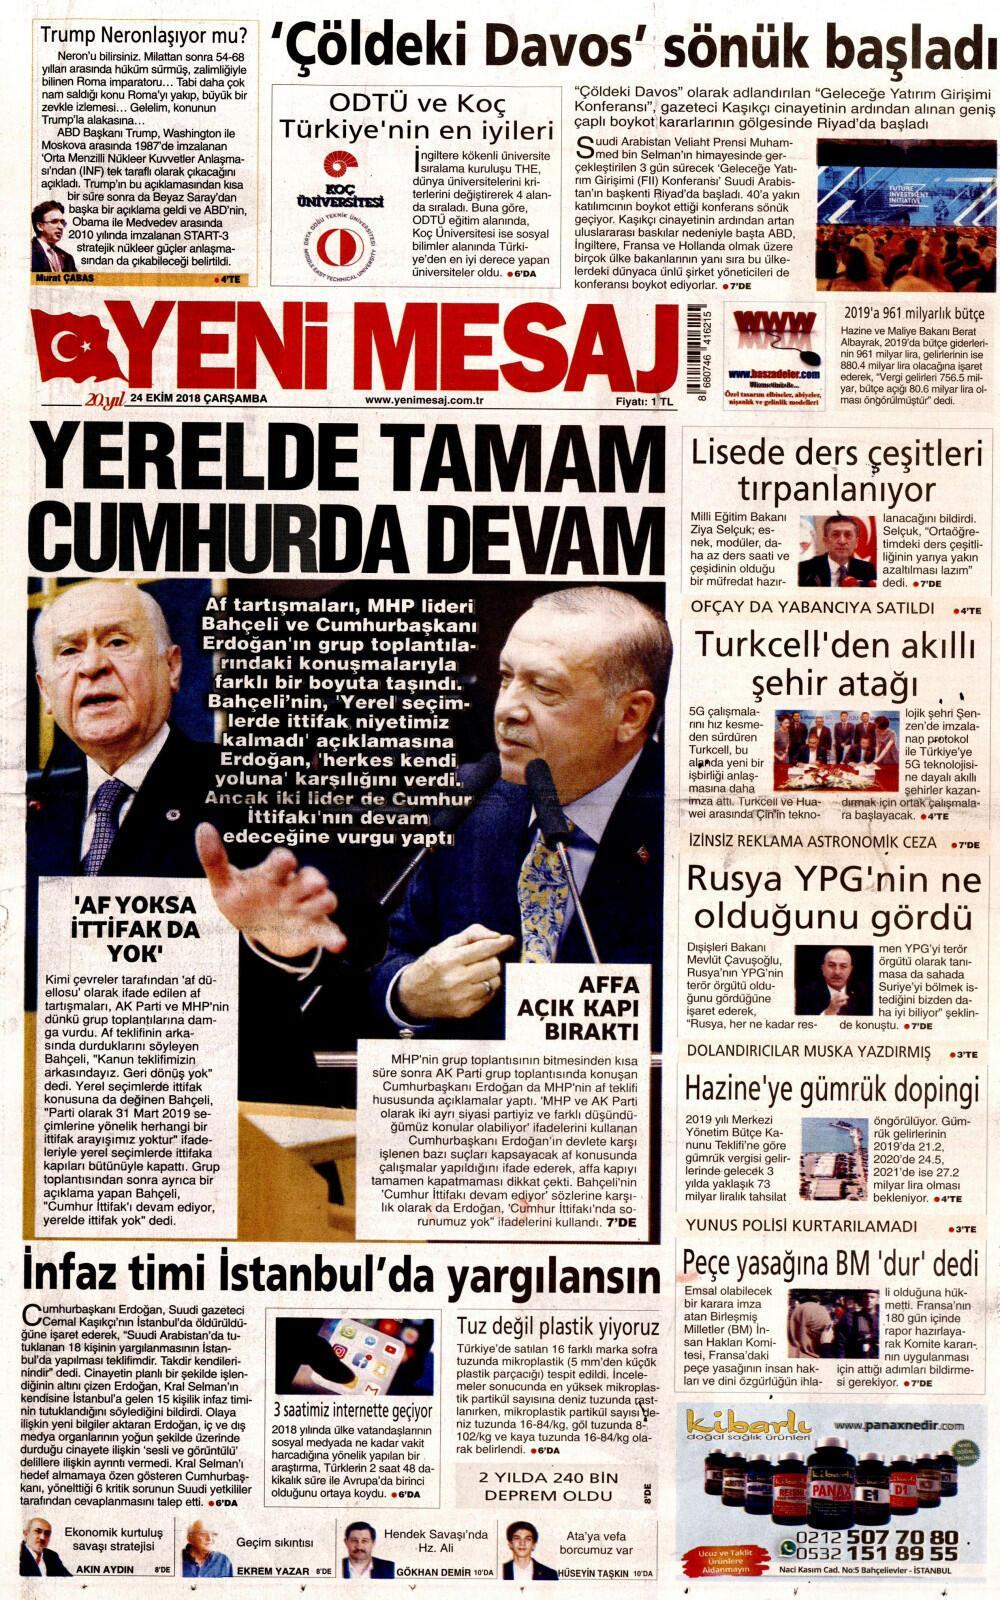 24 Ekim 2018 Gazete Manşetleri